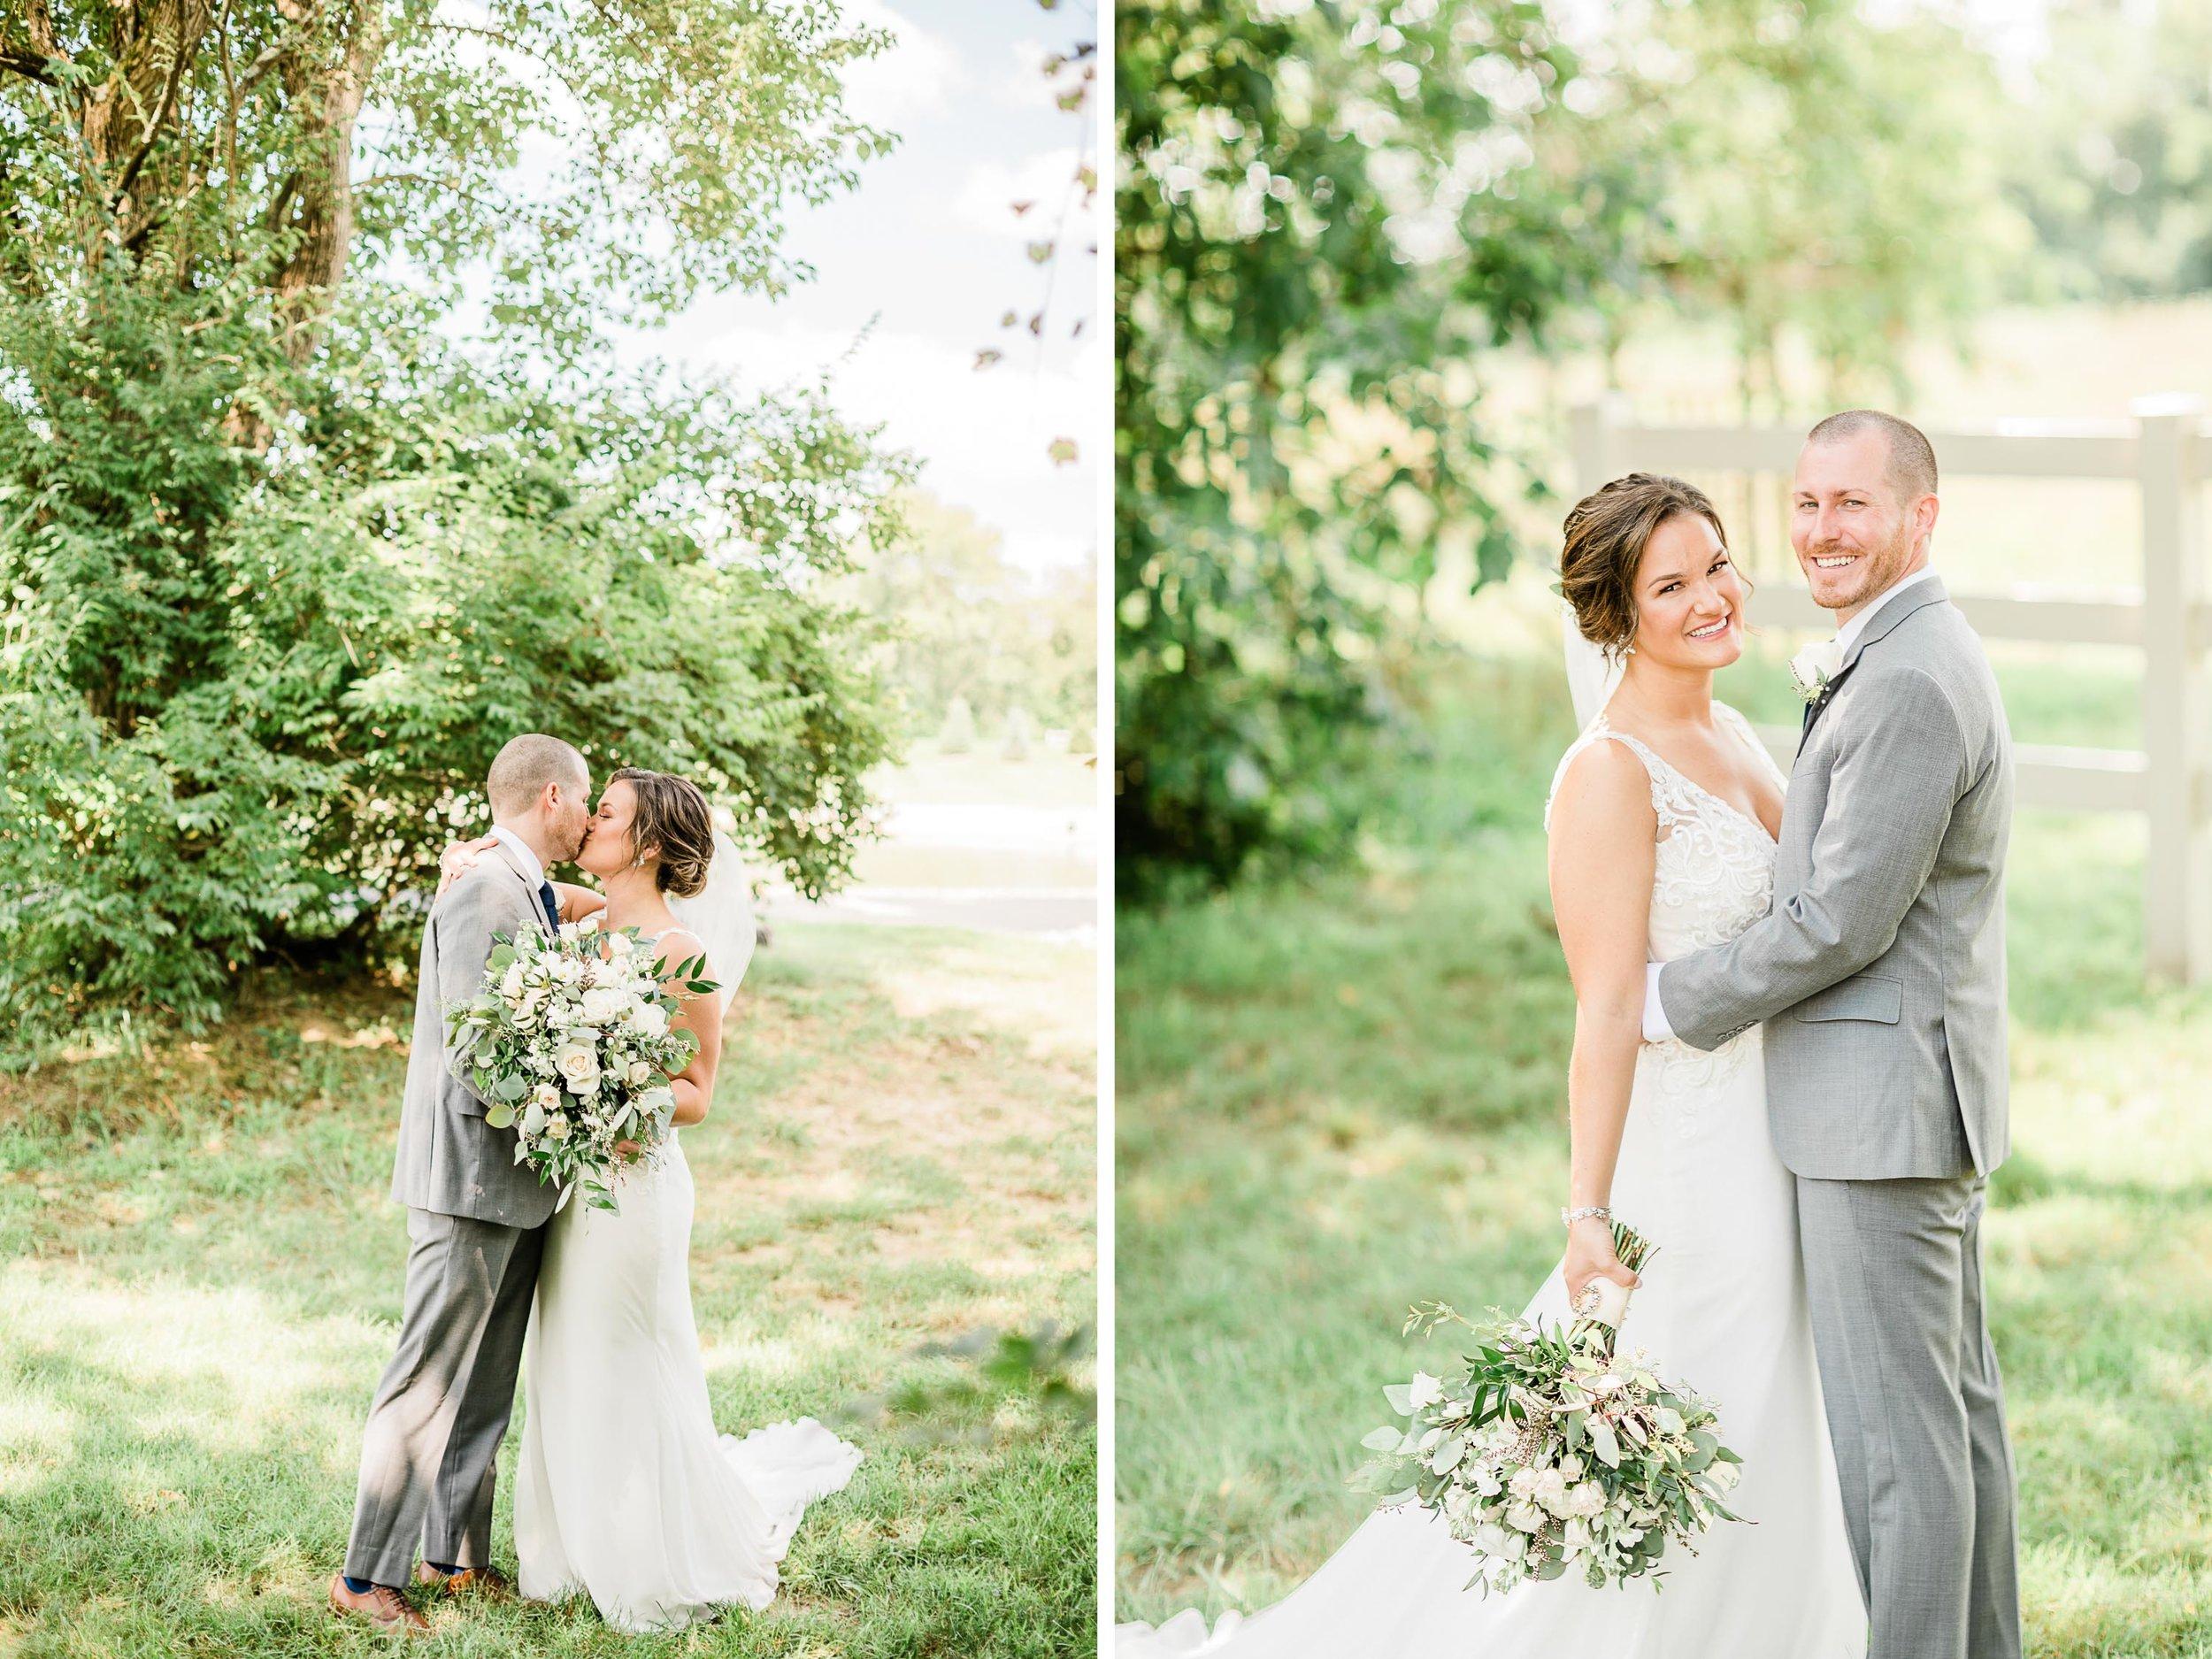 wedding photographers near me columbus ohio.jpg